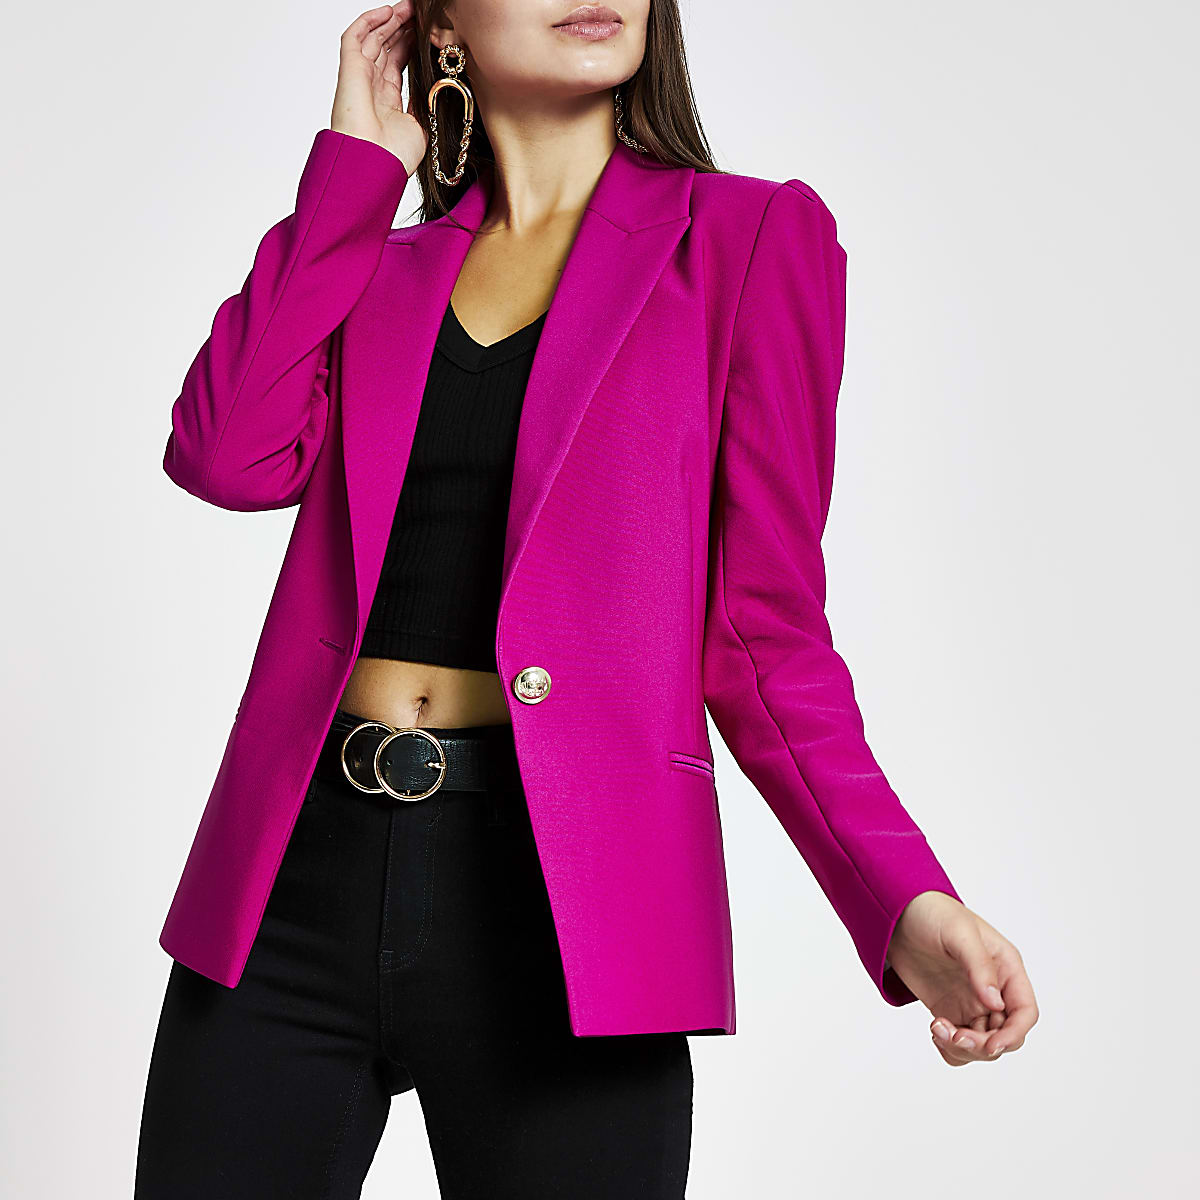 Purple puff sleeve blazer